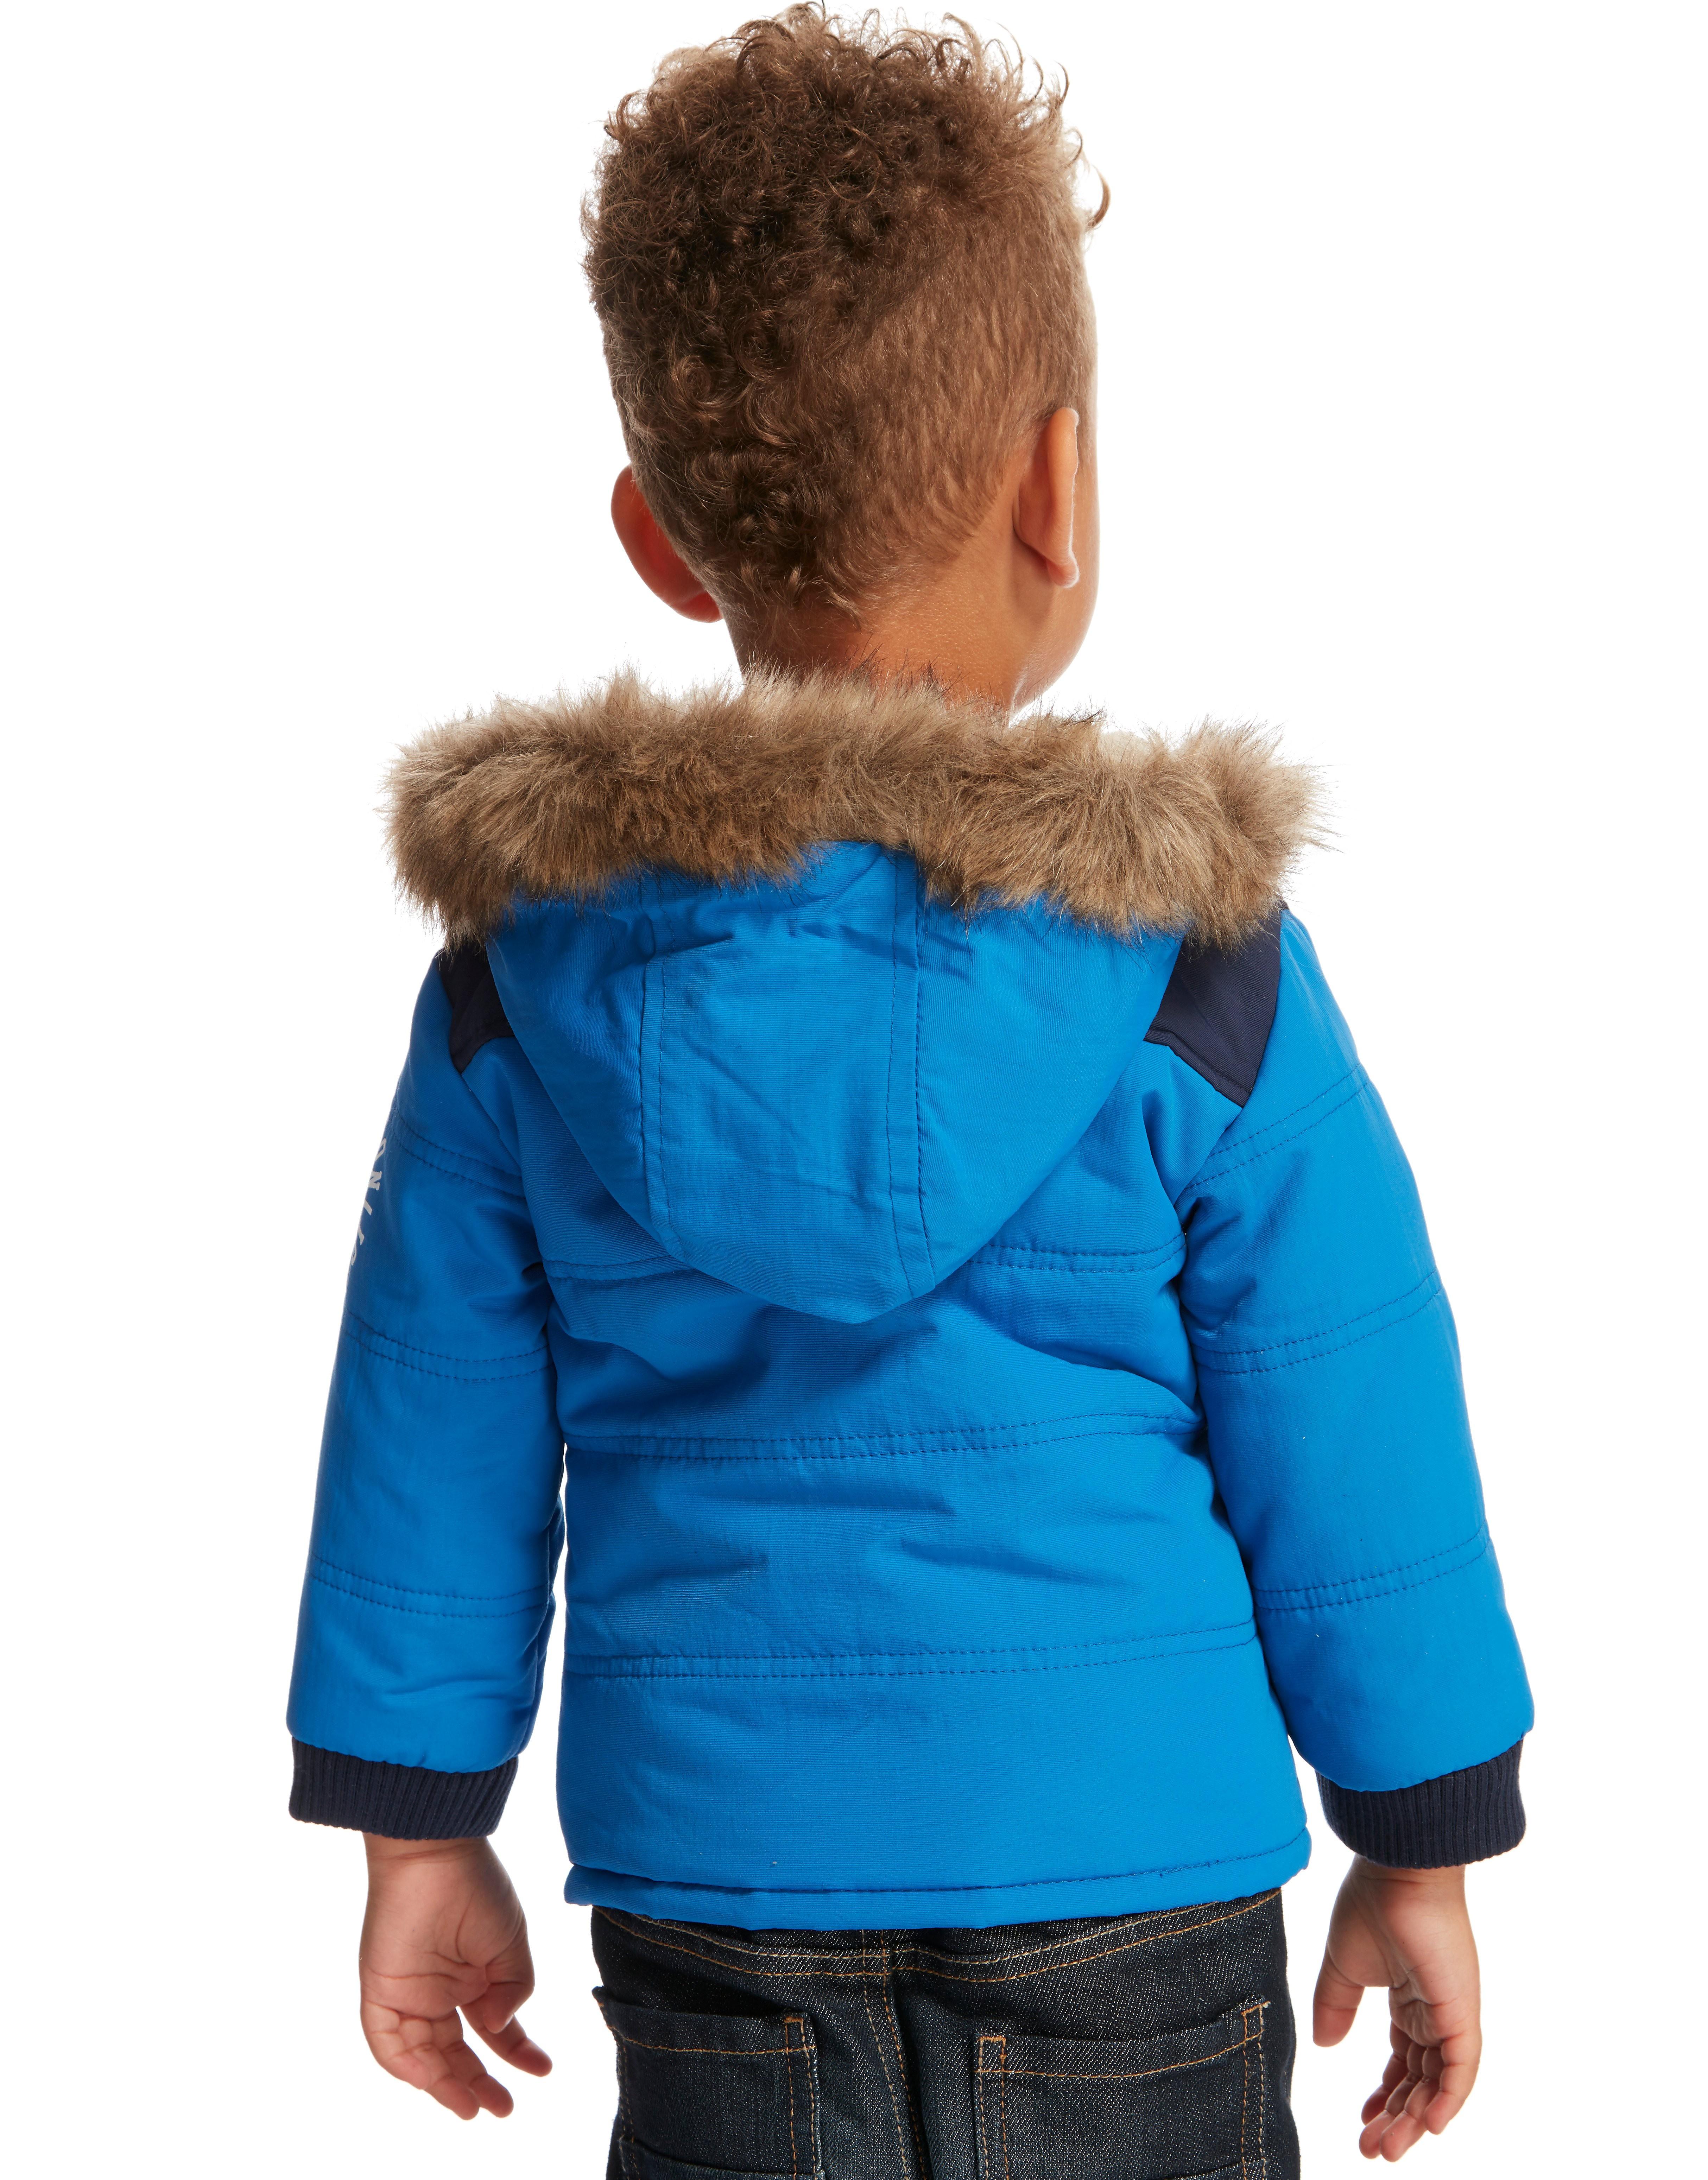 Nickelson Ripen Parka Jacket Infant